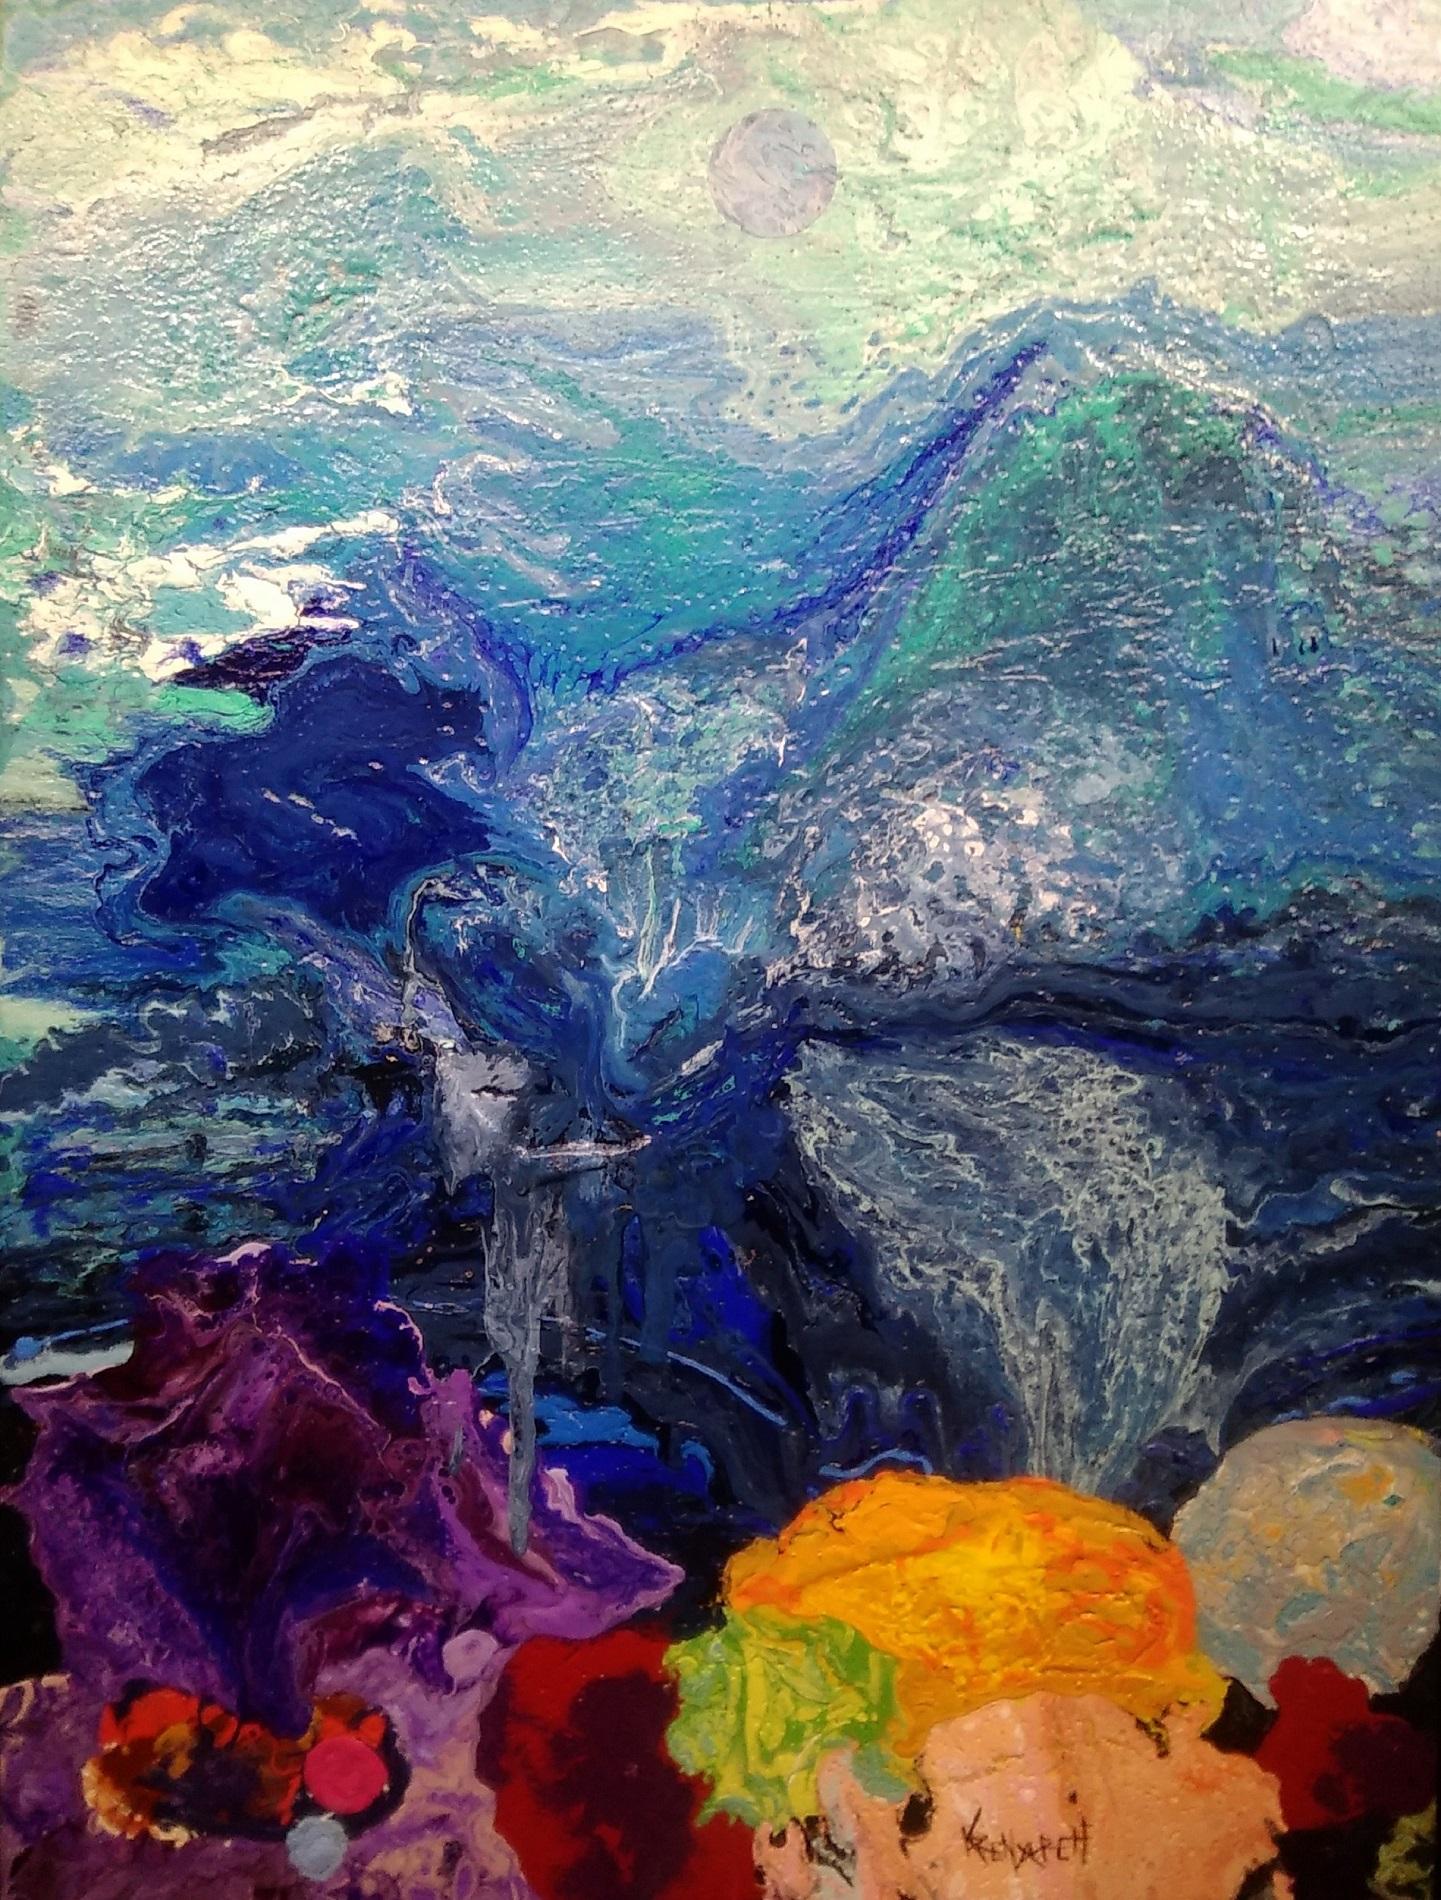 karen_garrett_flat_sculpture_coral_reef_$3,960_sold